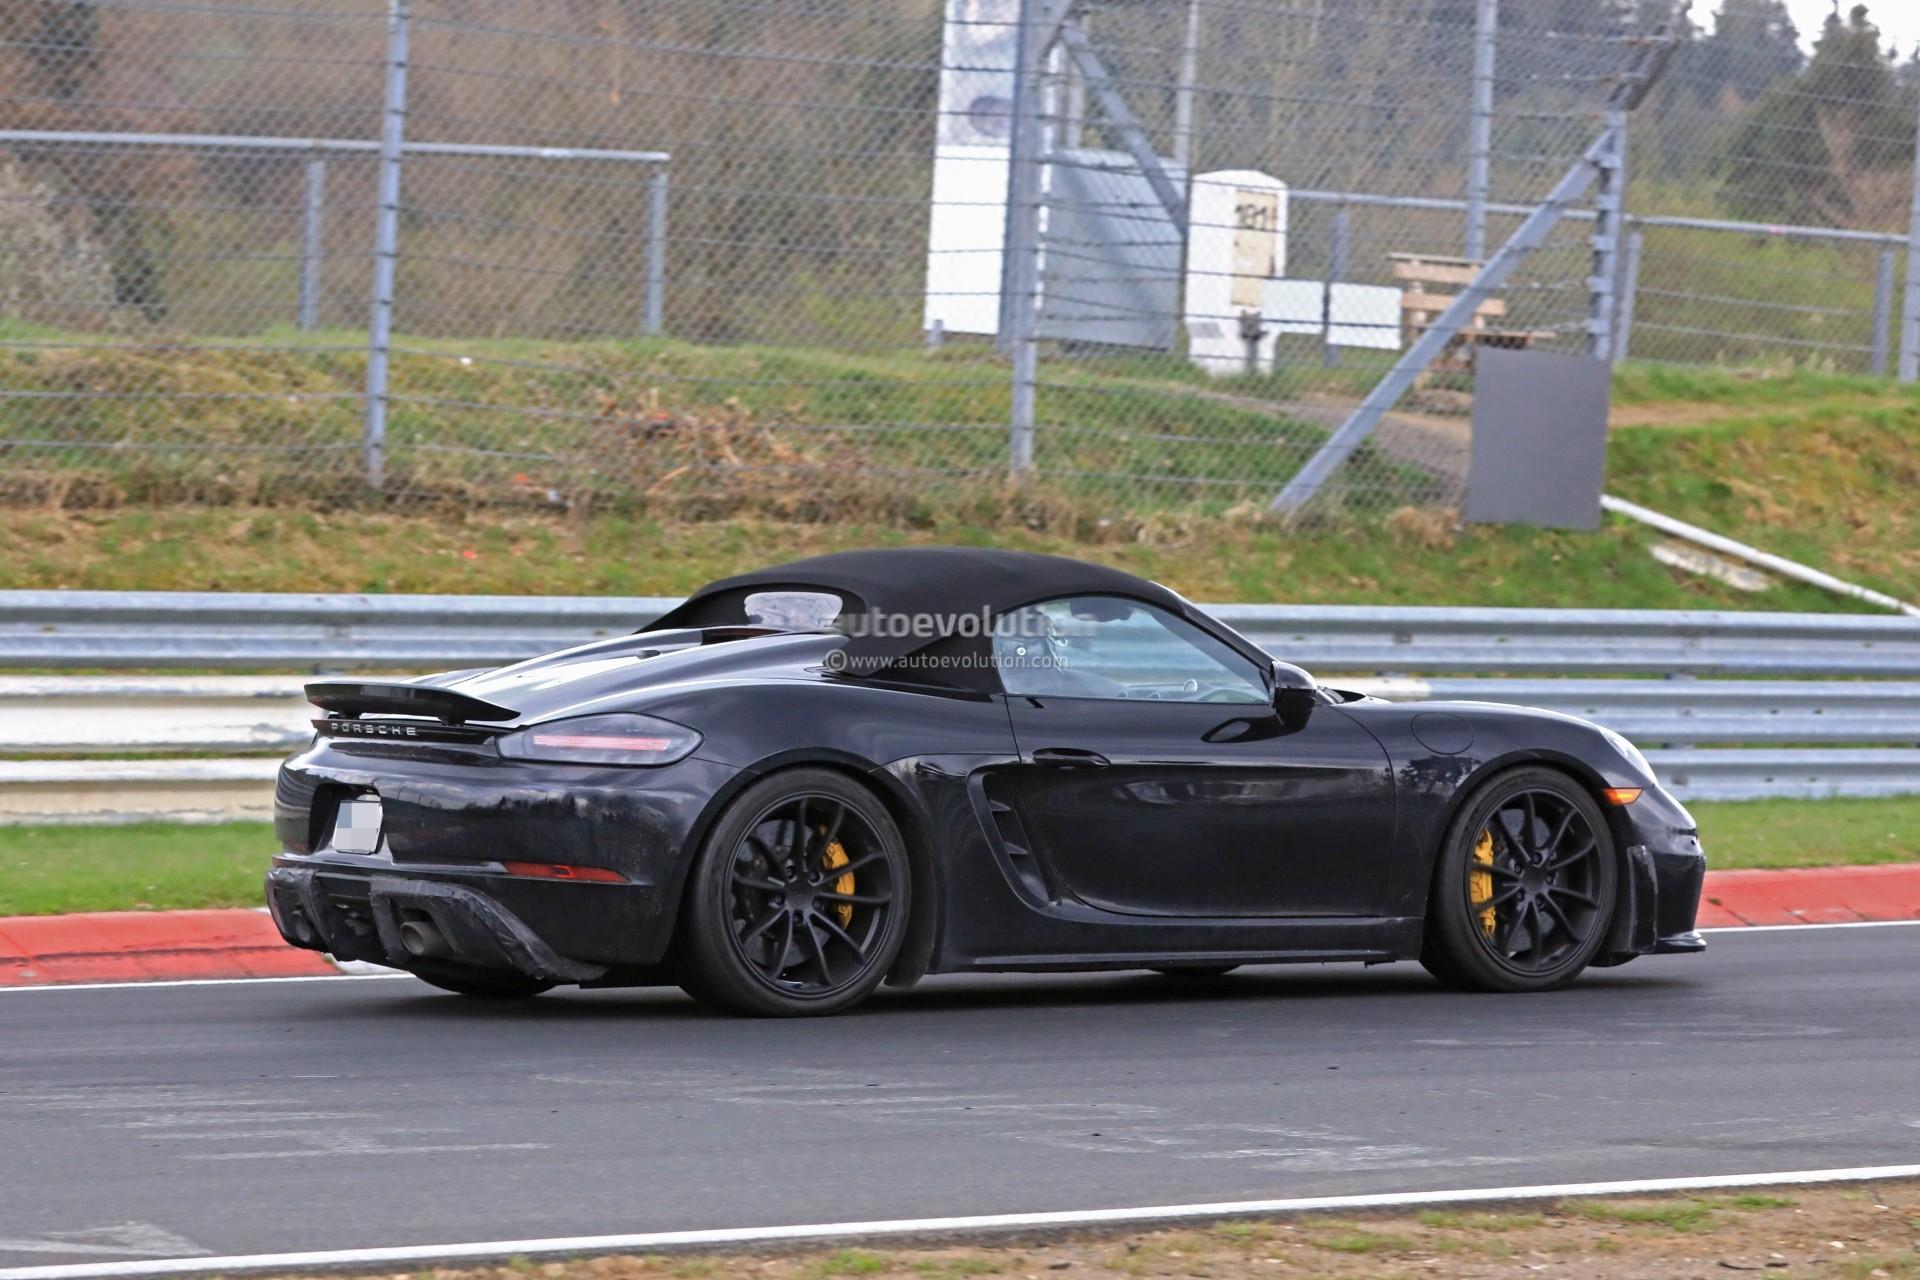 Spyshots: 2019 Porsche 718 Boxster Spyder Hits Nurburgring ...